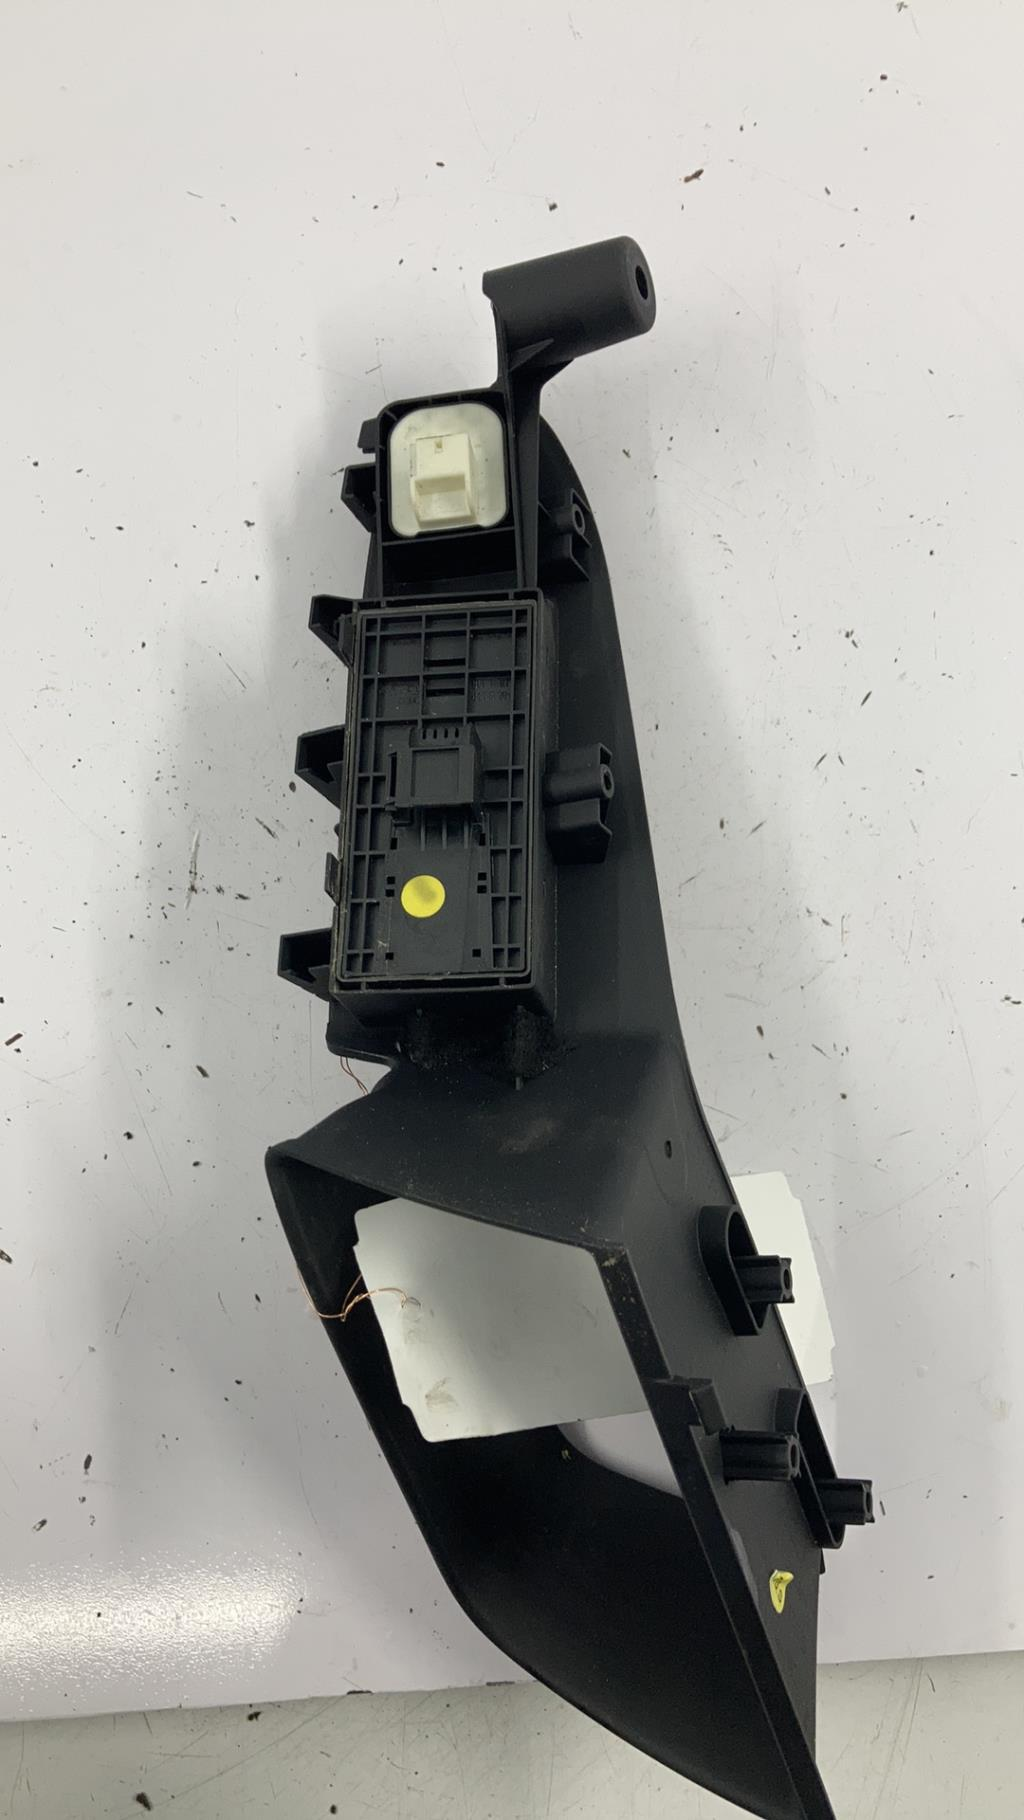 Bouton/Interrupteur AUDI A4 3 PHASE 1 Diesel